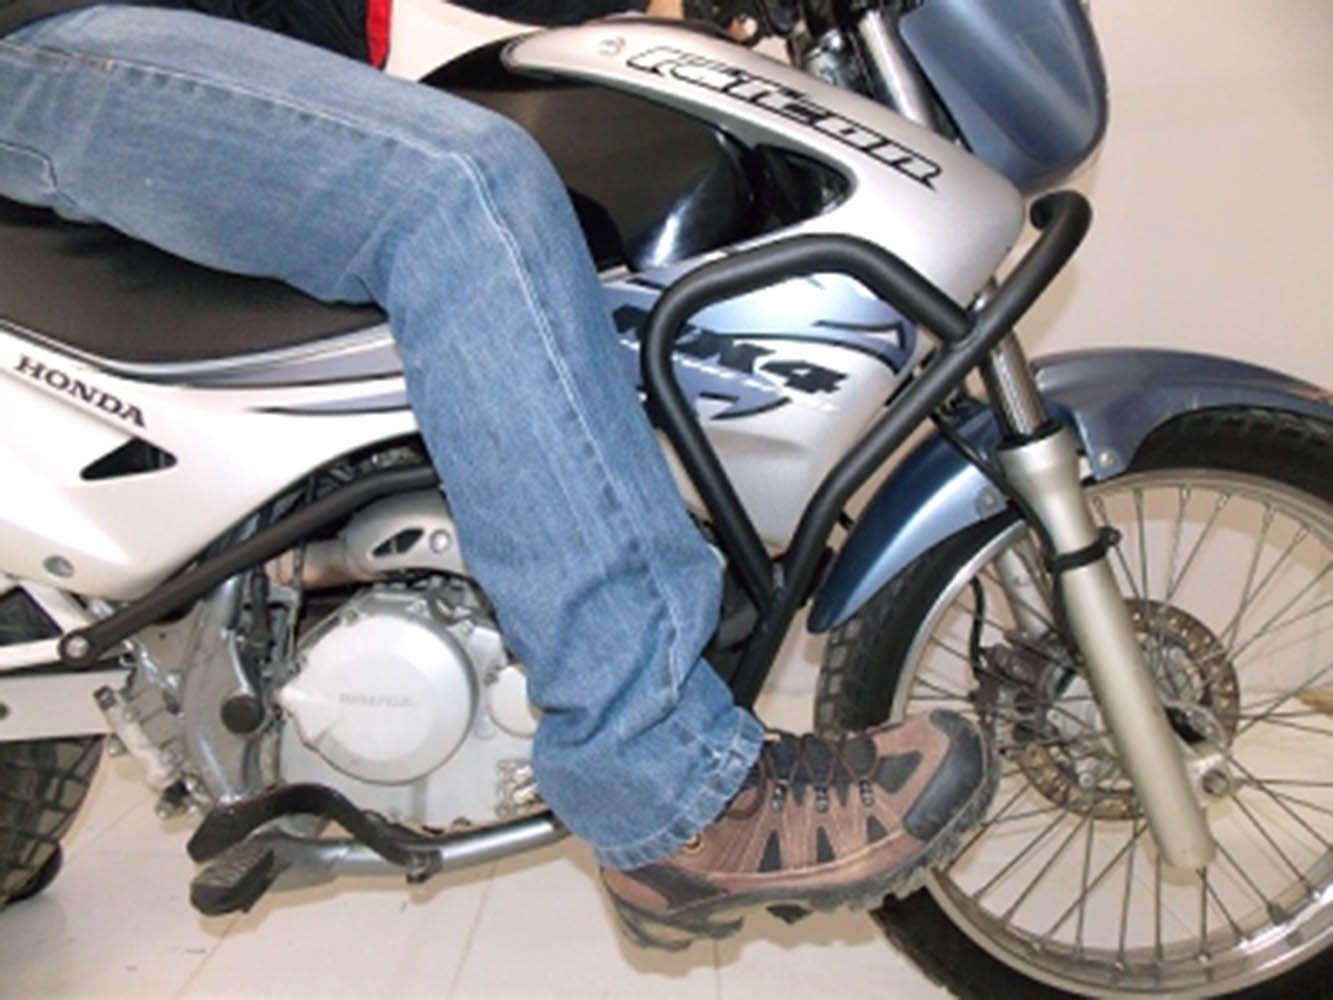 Protetor Carenagem Motor Nx 400 Falcon Preto Chapam 881